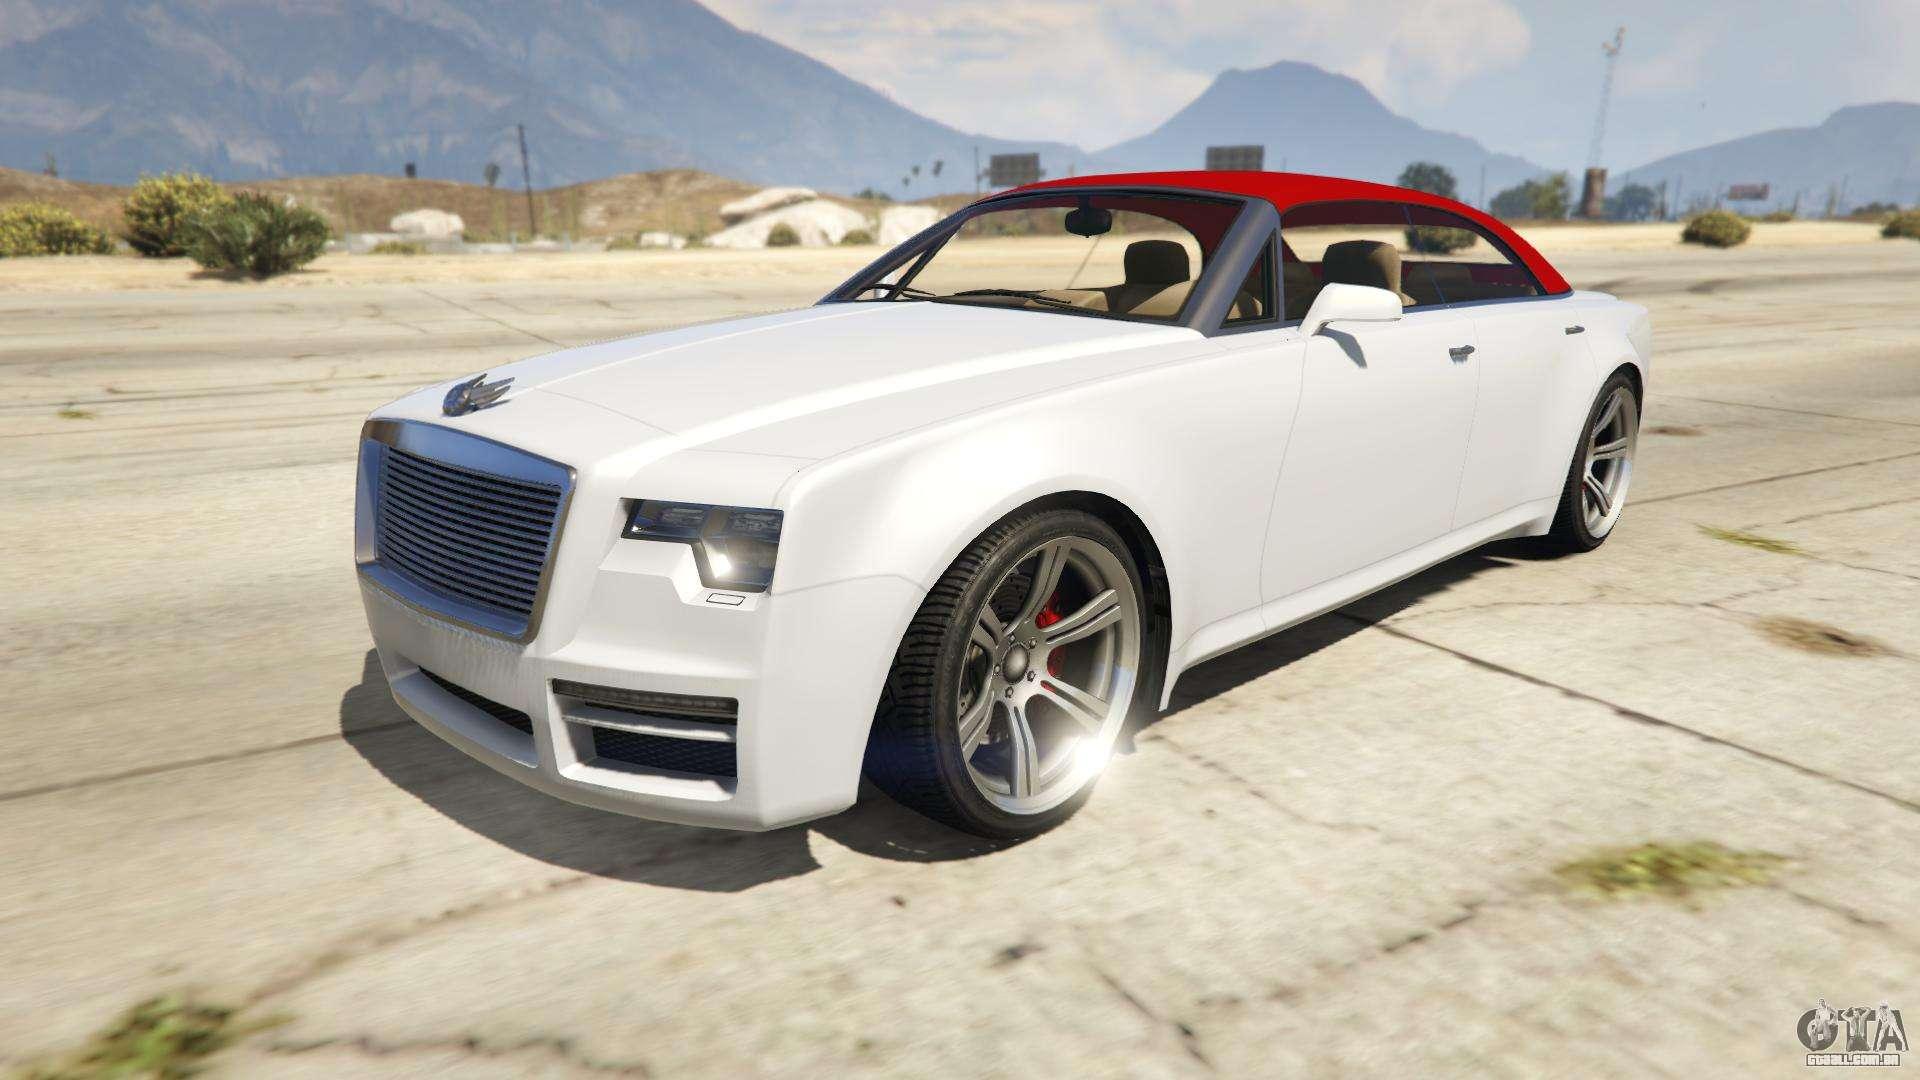 Enus Windsor Drop de GTA 5 - vista frontal